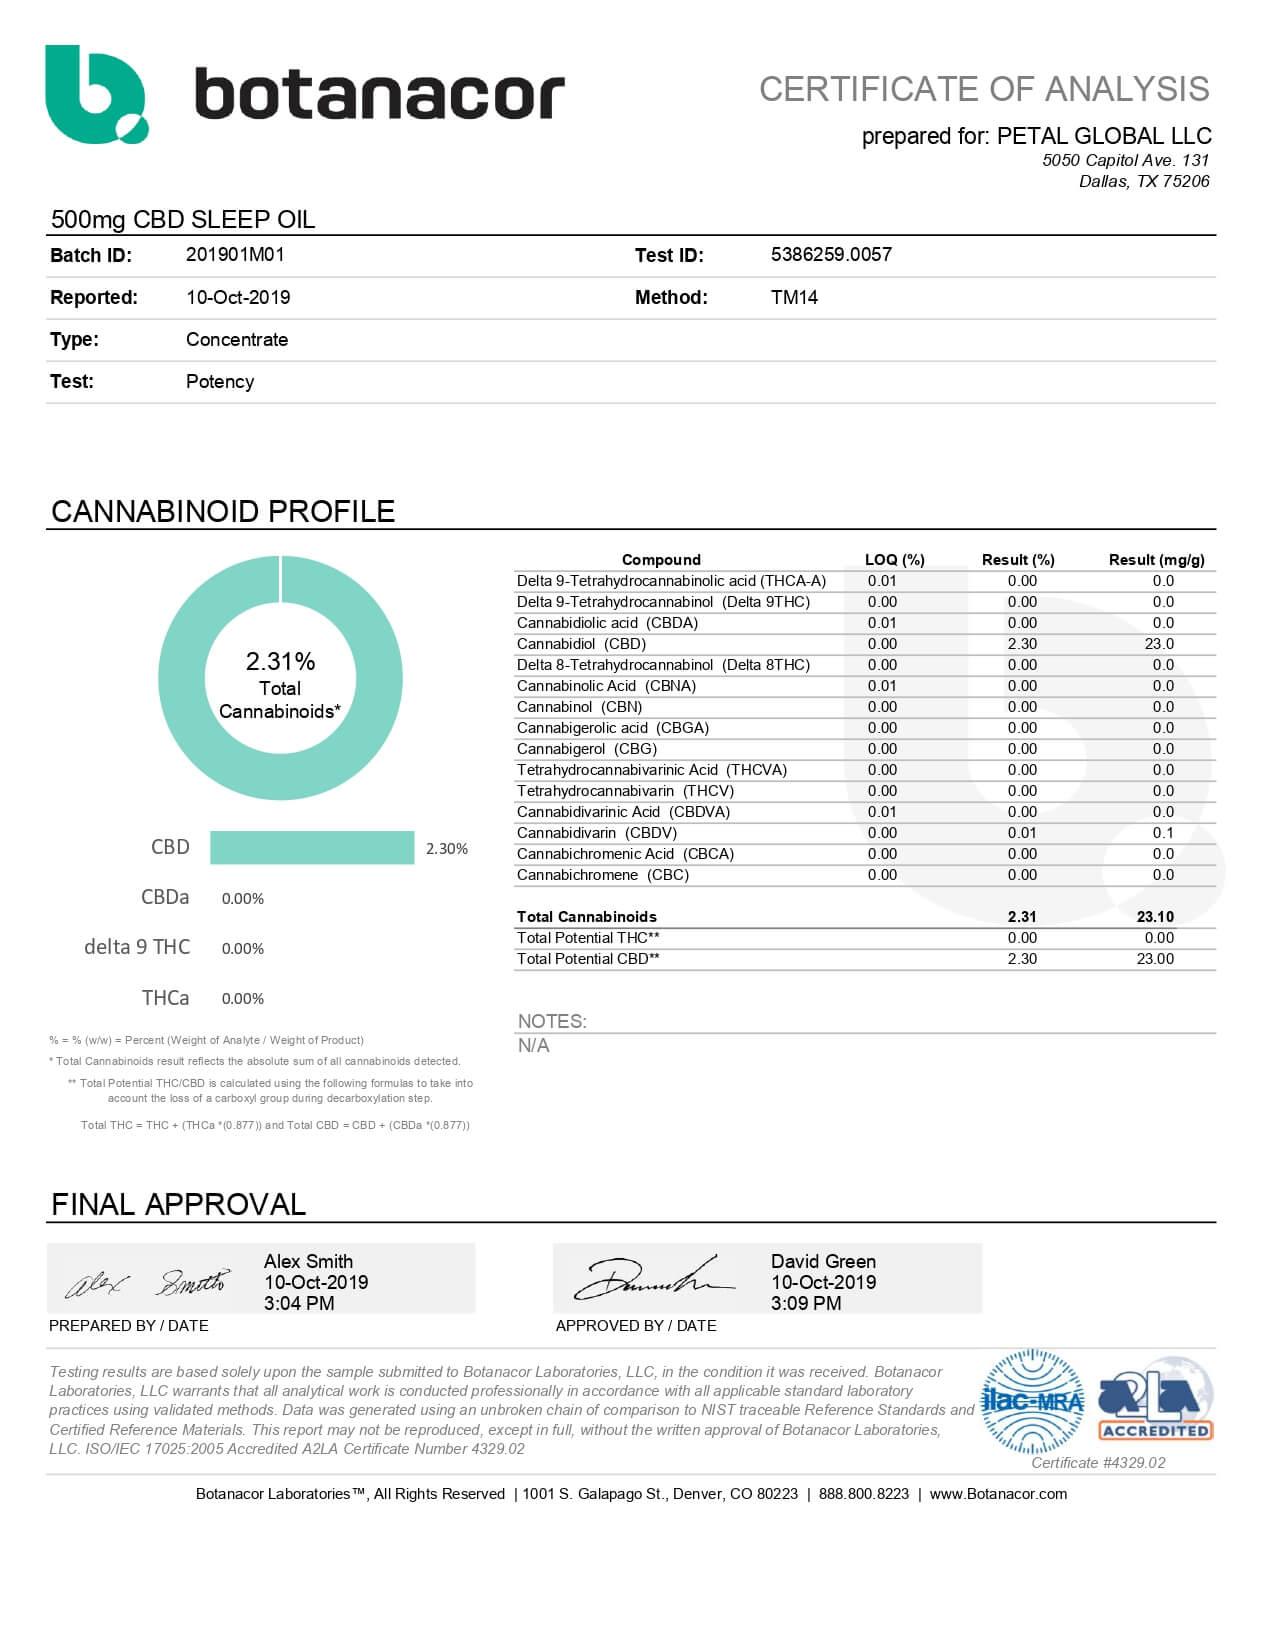 Petal CBD Sleep Tincture Vanilla Lab Report